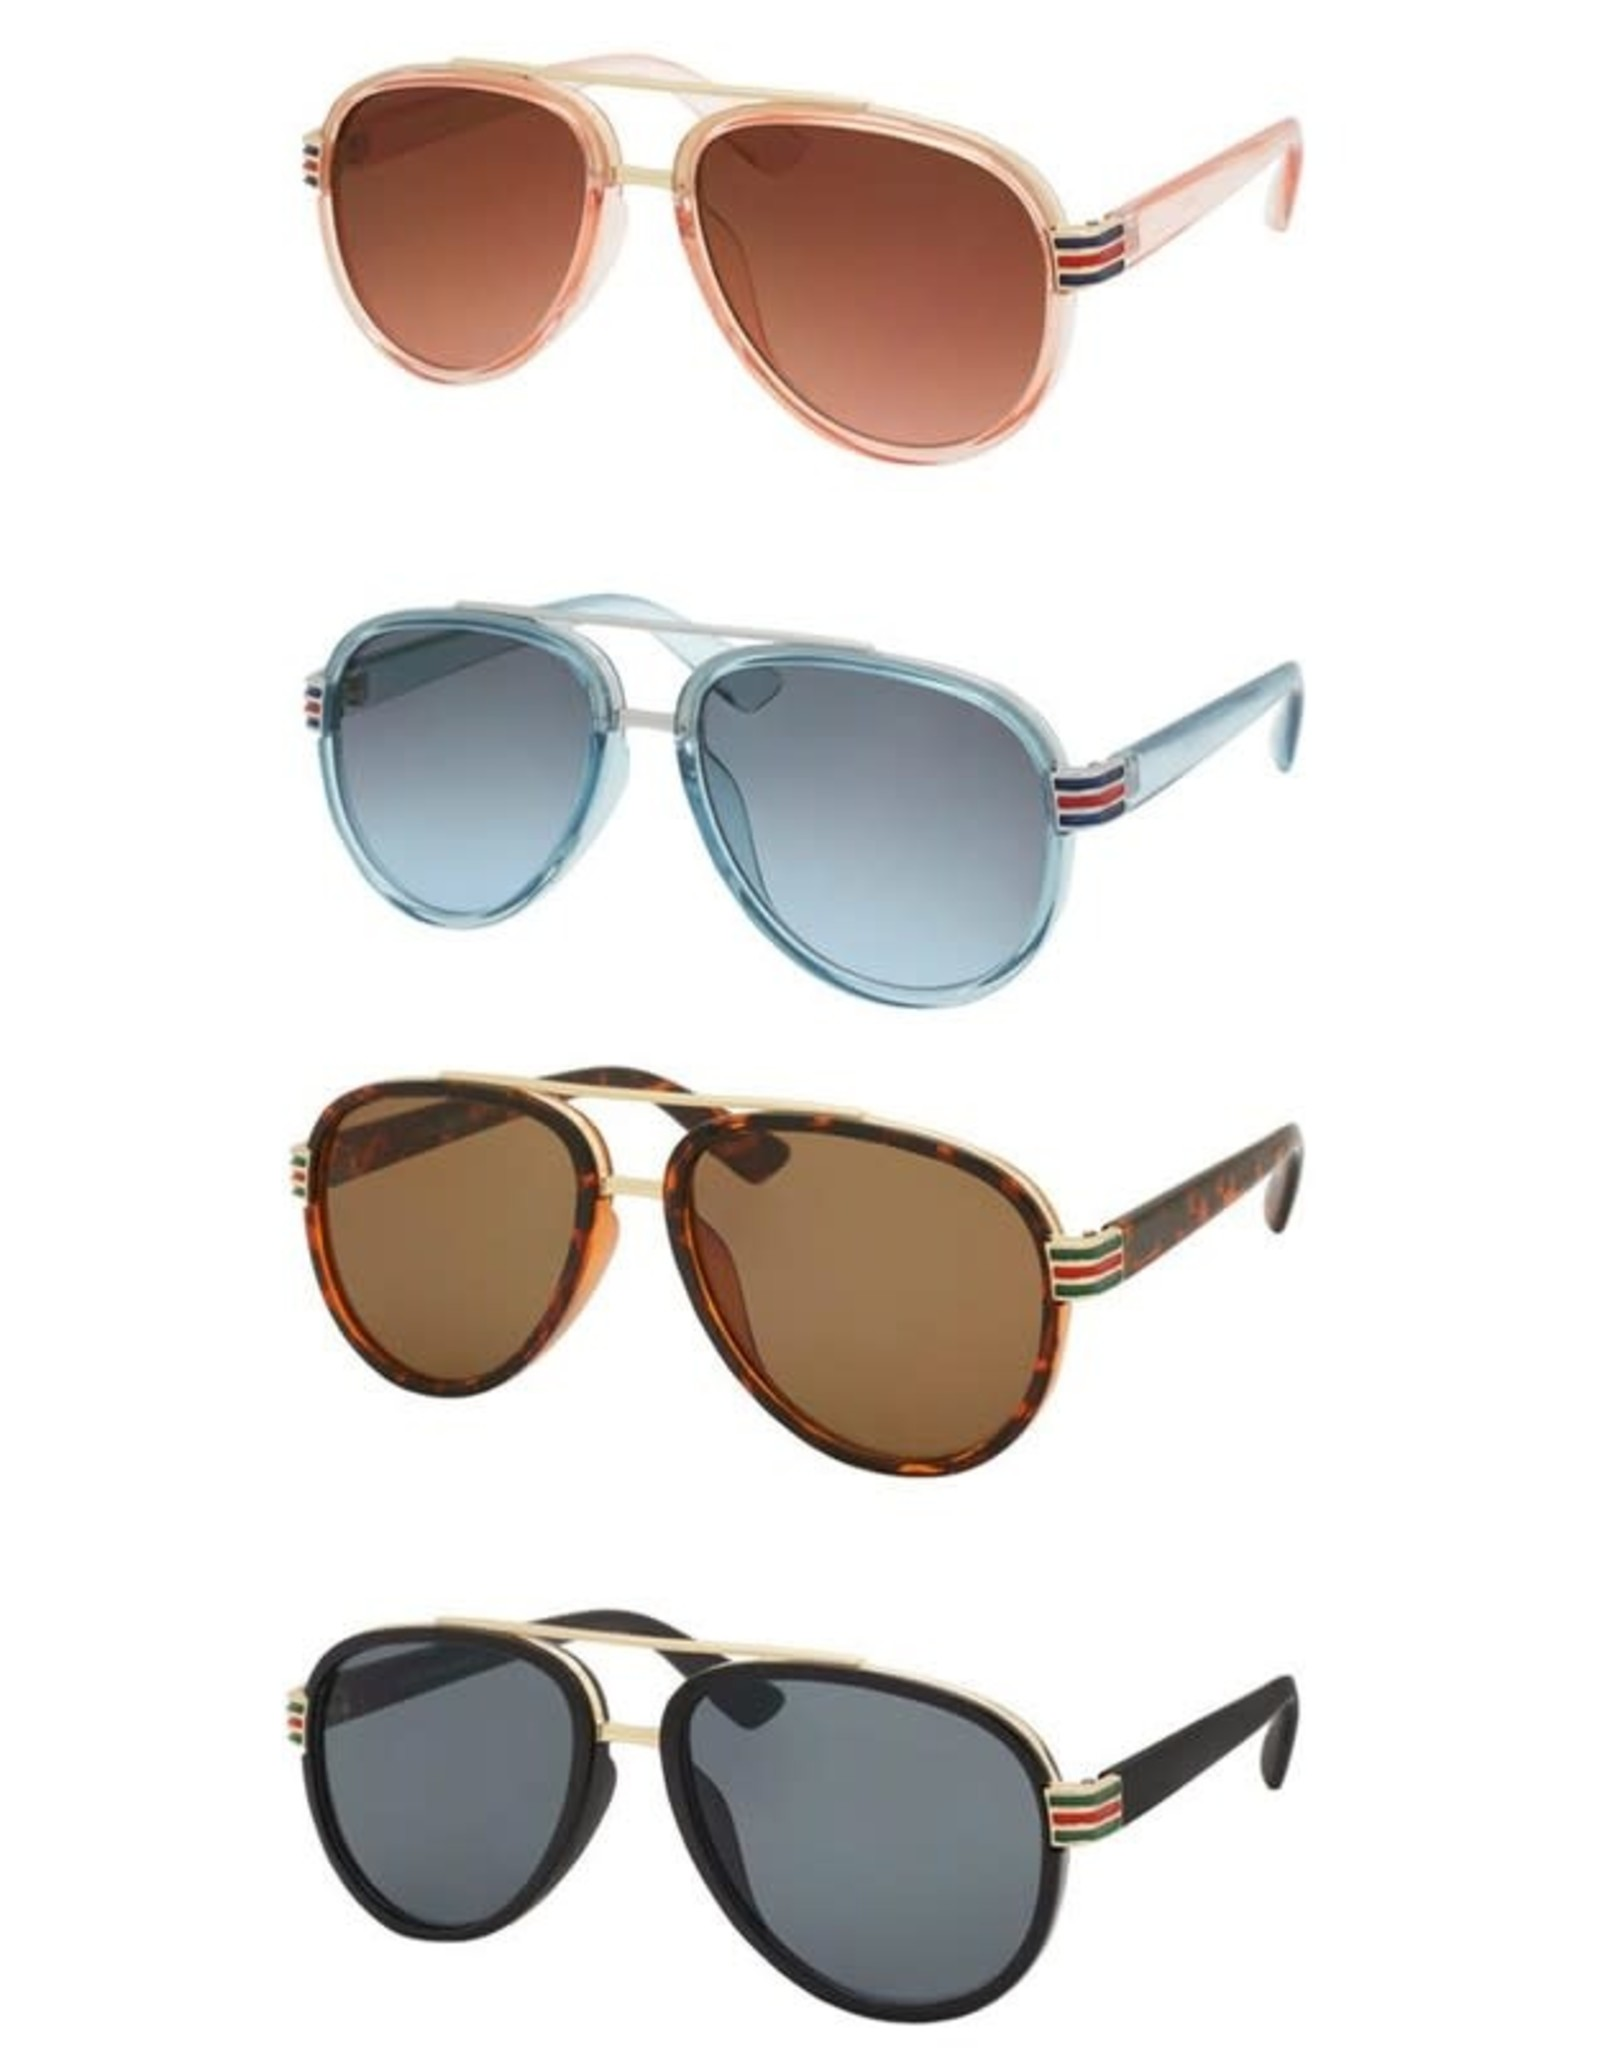 Funteze Accessories SHADY Sunglasses